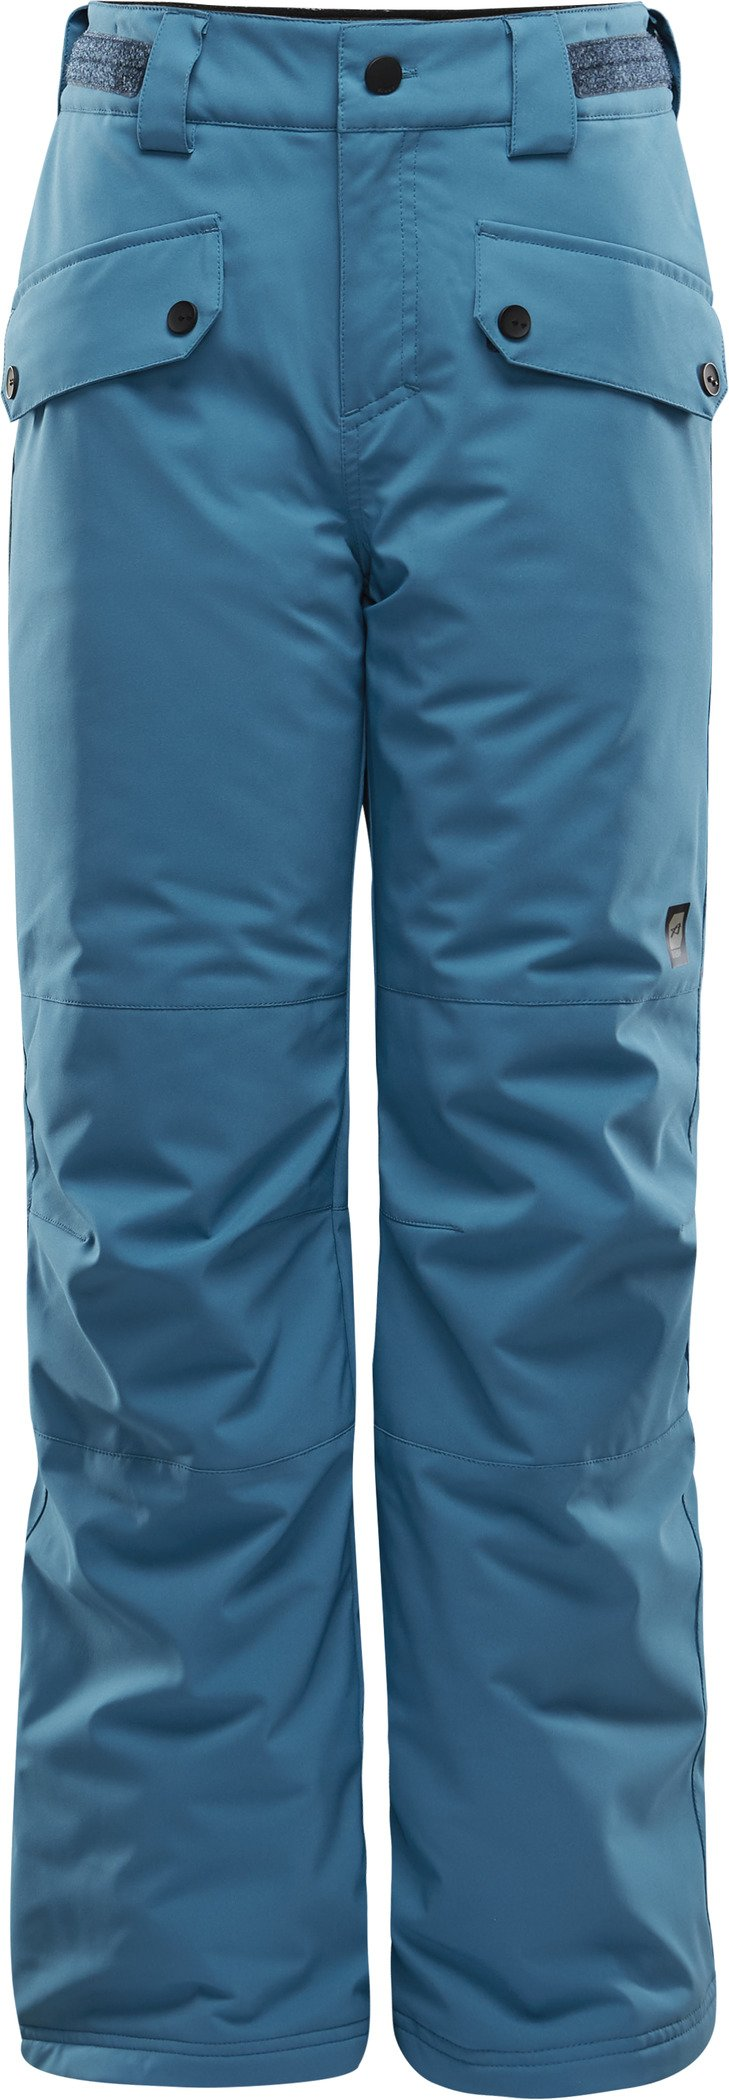 Orage Boys Tarzo Pants, Spectrum Blue, Size 10